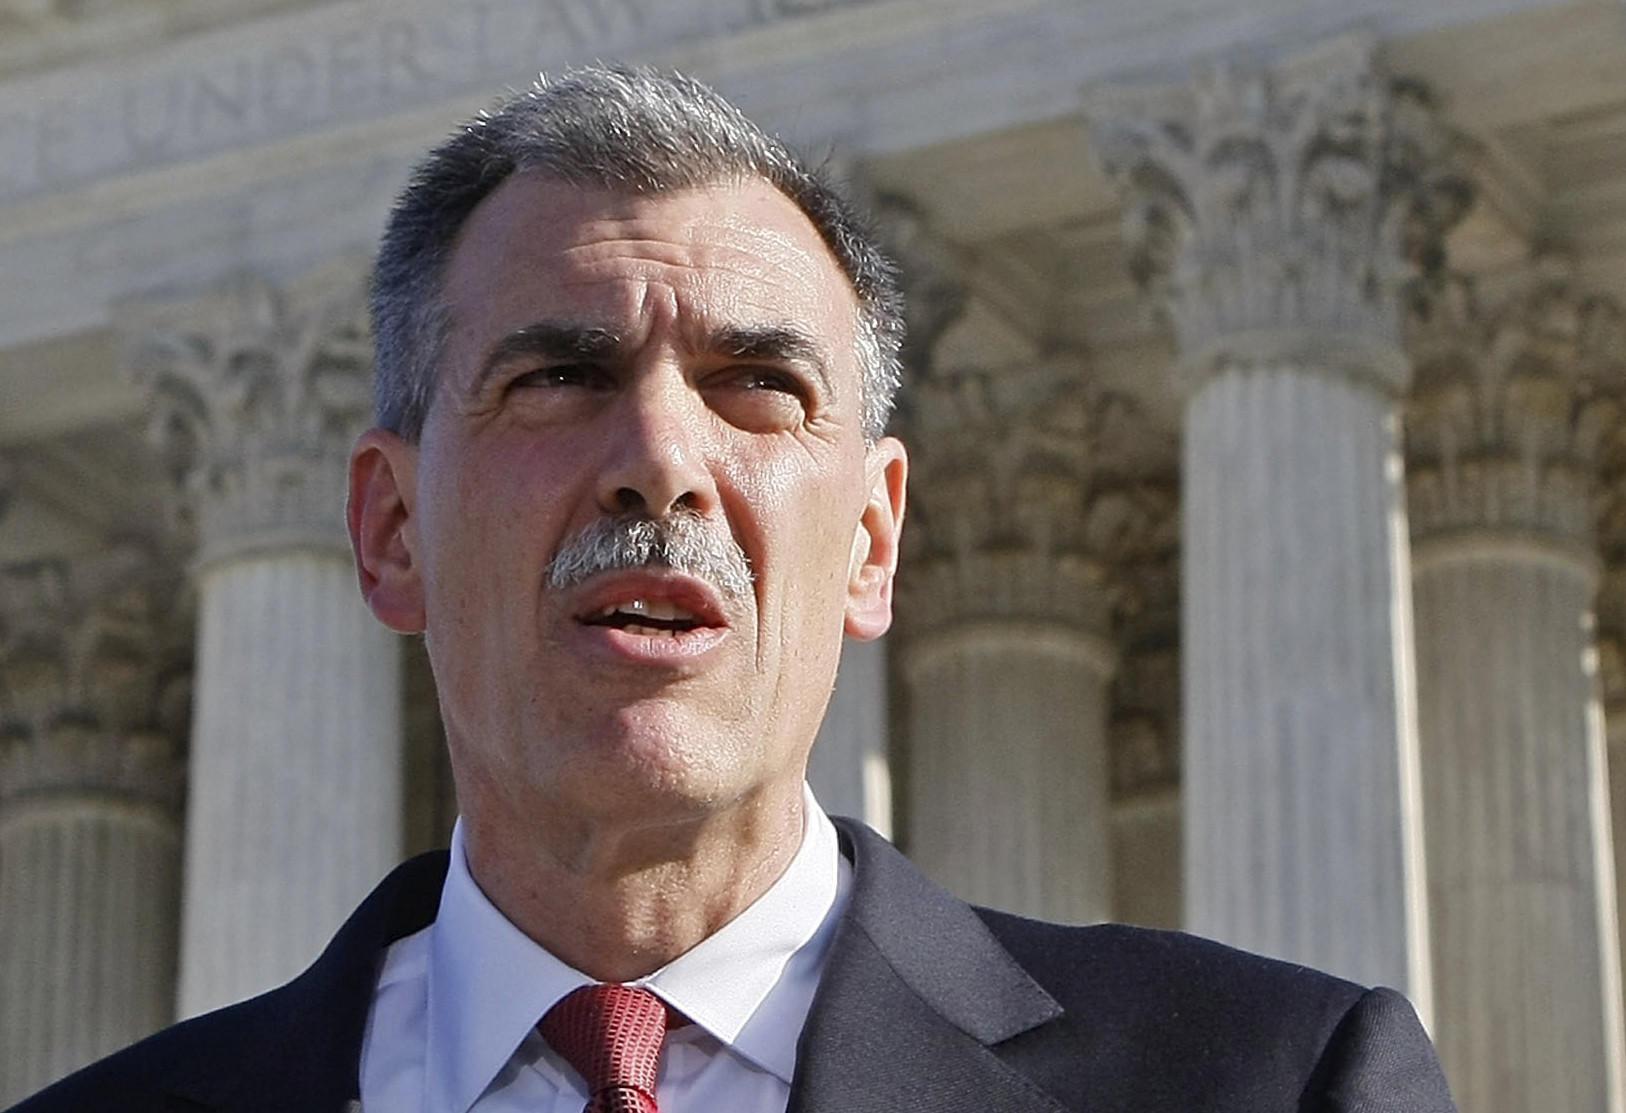 U.S. Solicitor Gen. Donald Verrilli Jr. will defend Obamacare's contraceptive mandate before the Supreme Court.